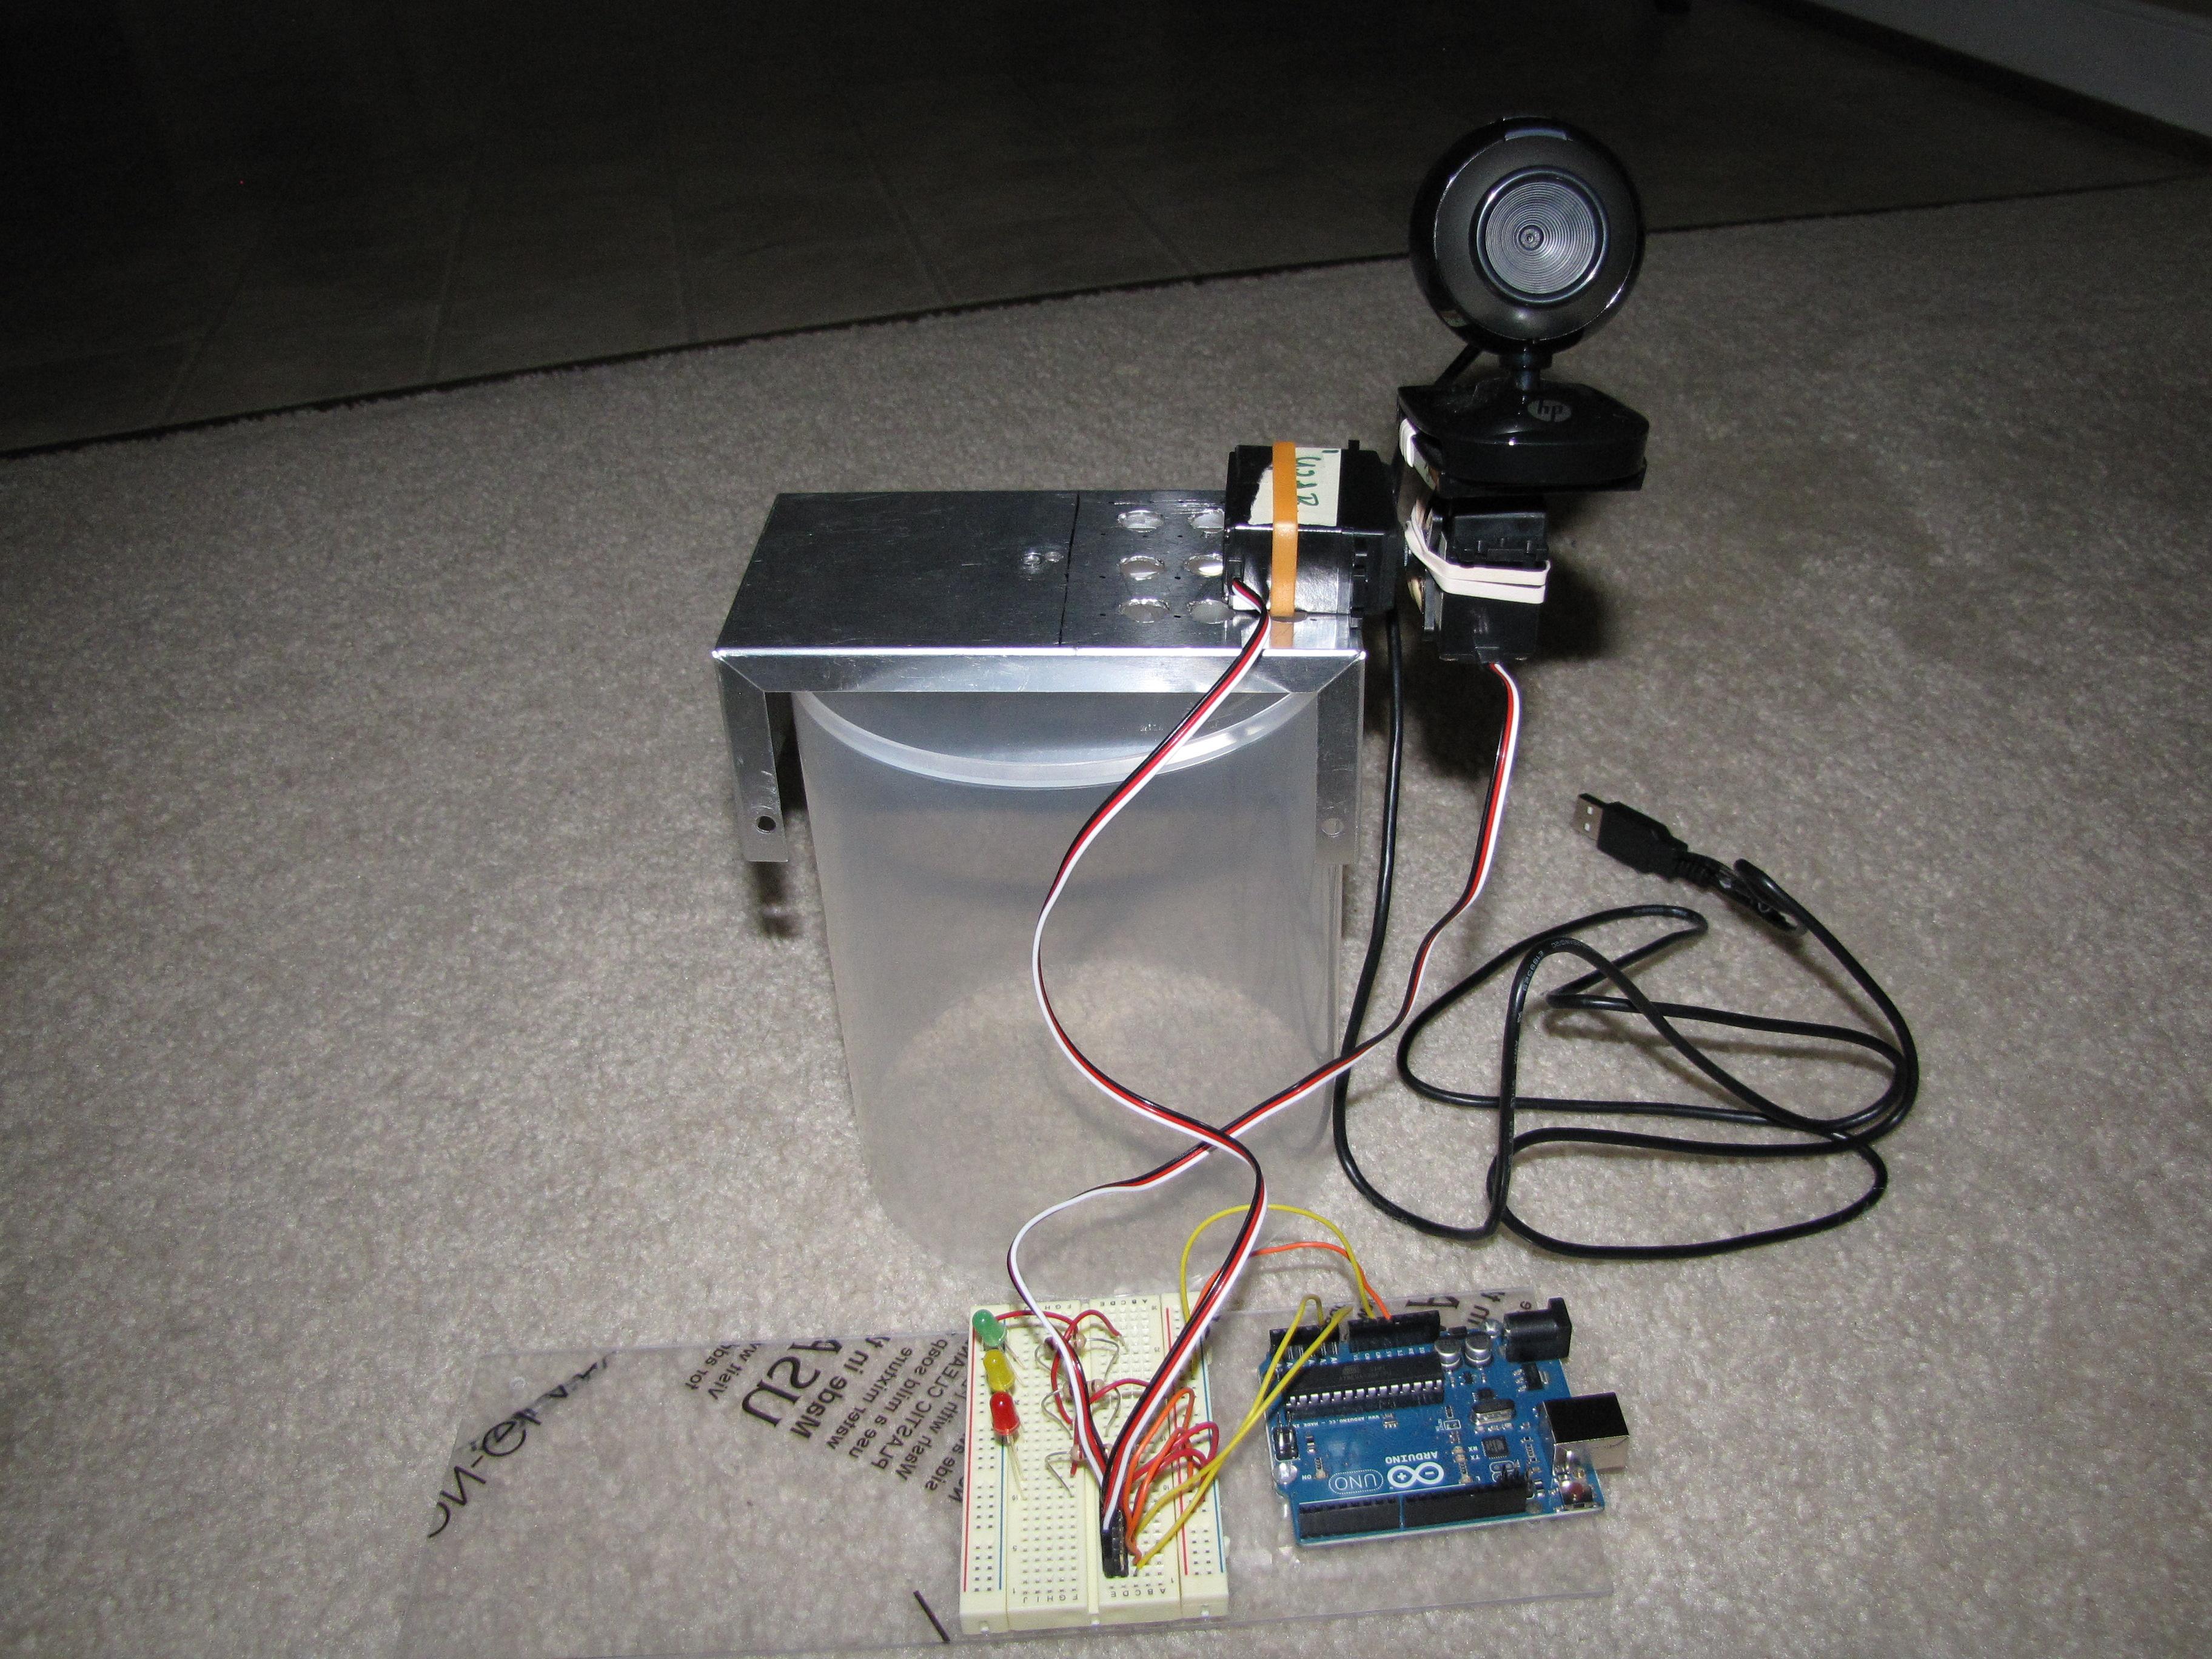 Arduino + 2 servos + mouse